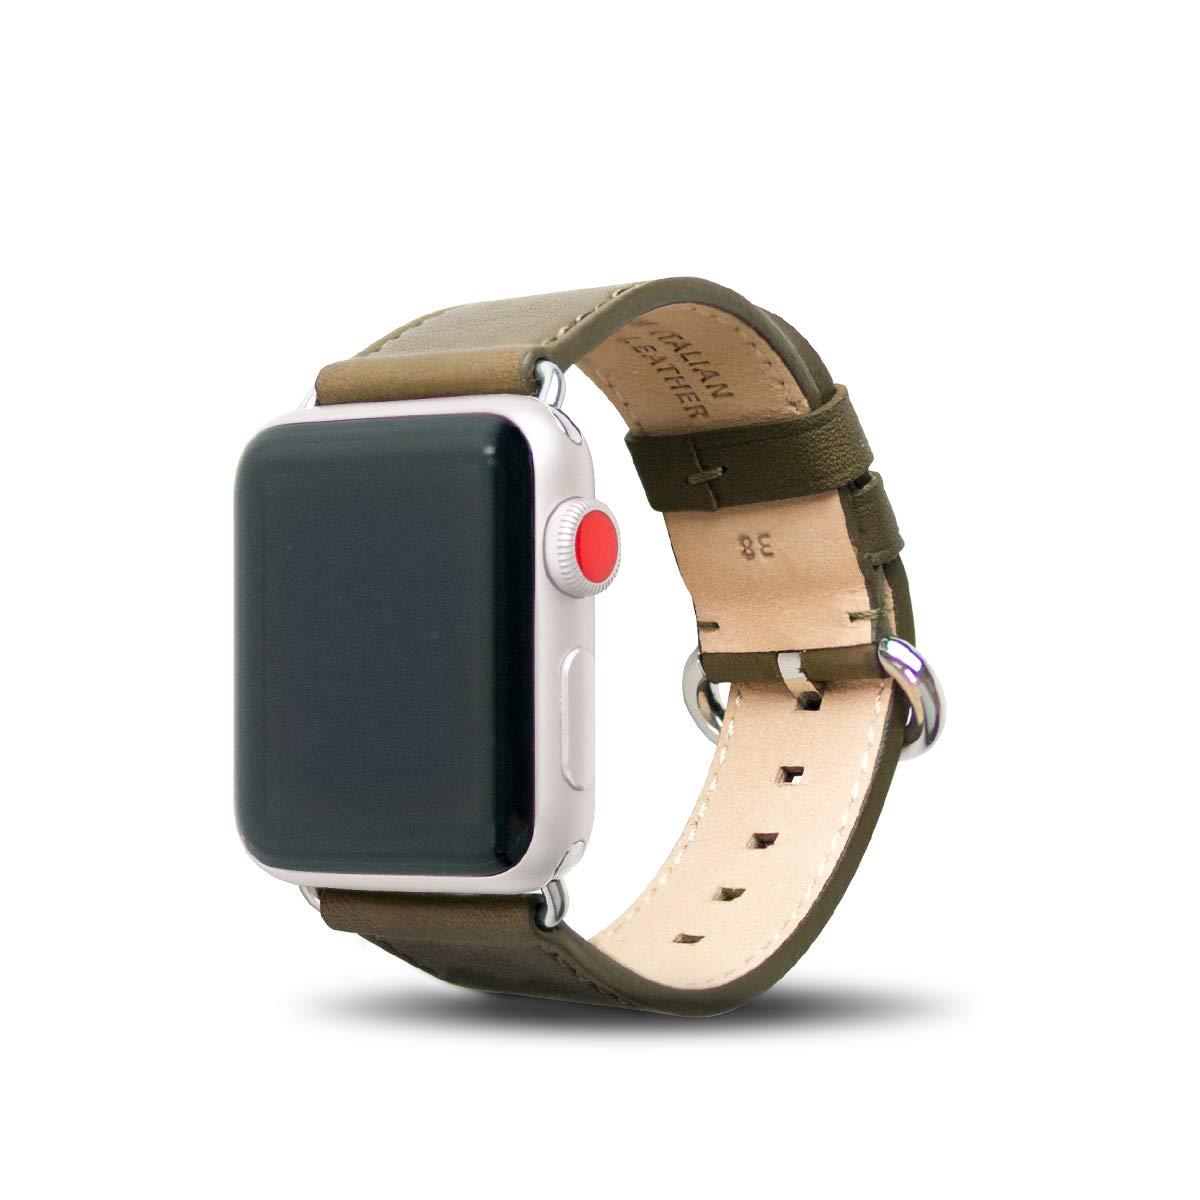 Alto Handmade Premium Italian Leather Strap for Apple Watch 40mm / 38mm (Olive)